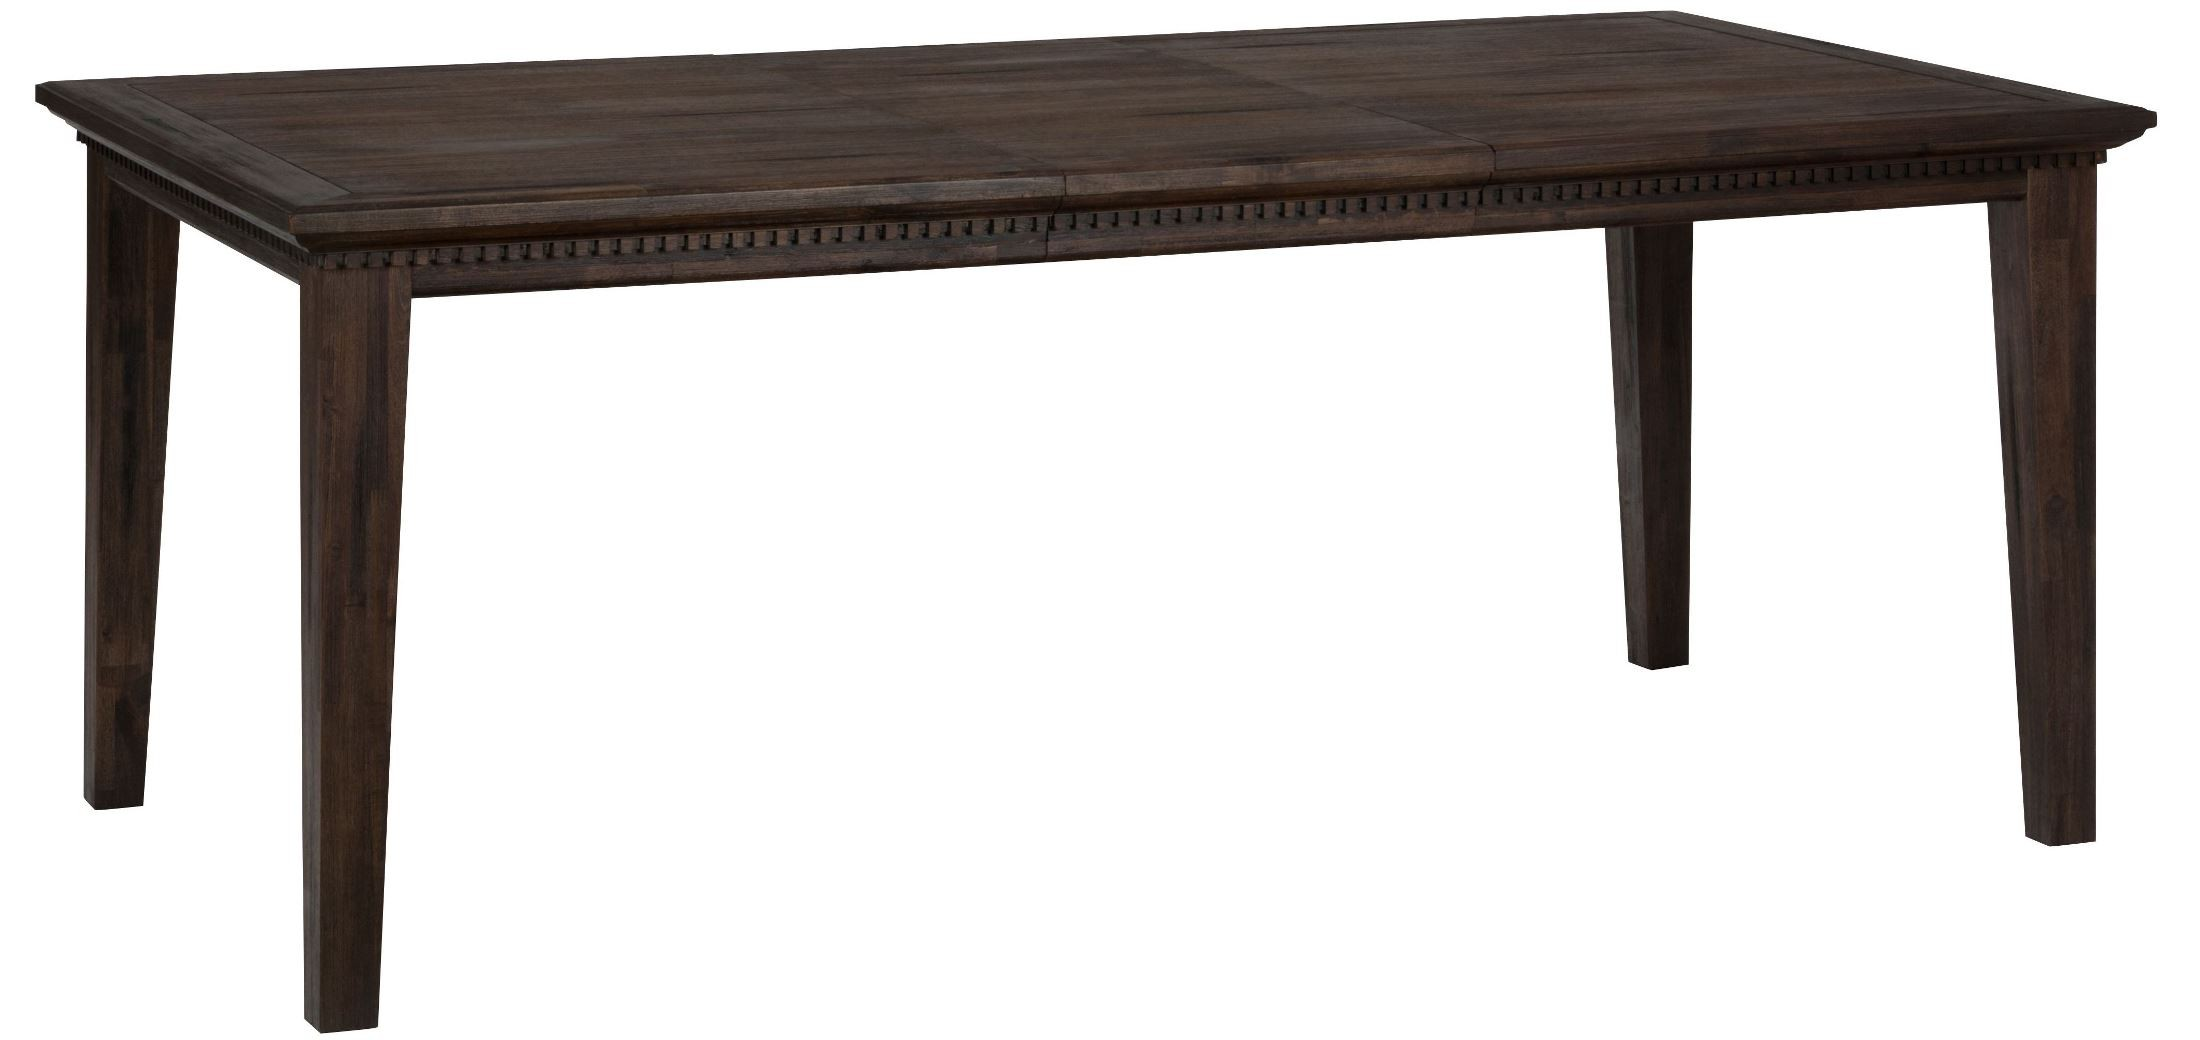 Geneva hills rustic brown extendable rectangular dining